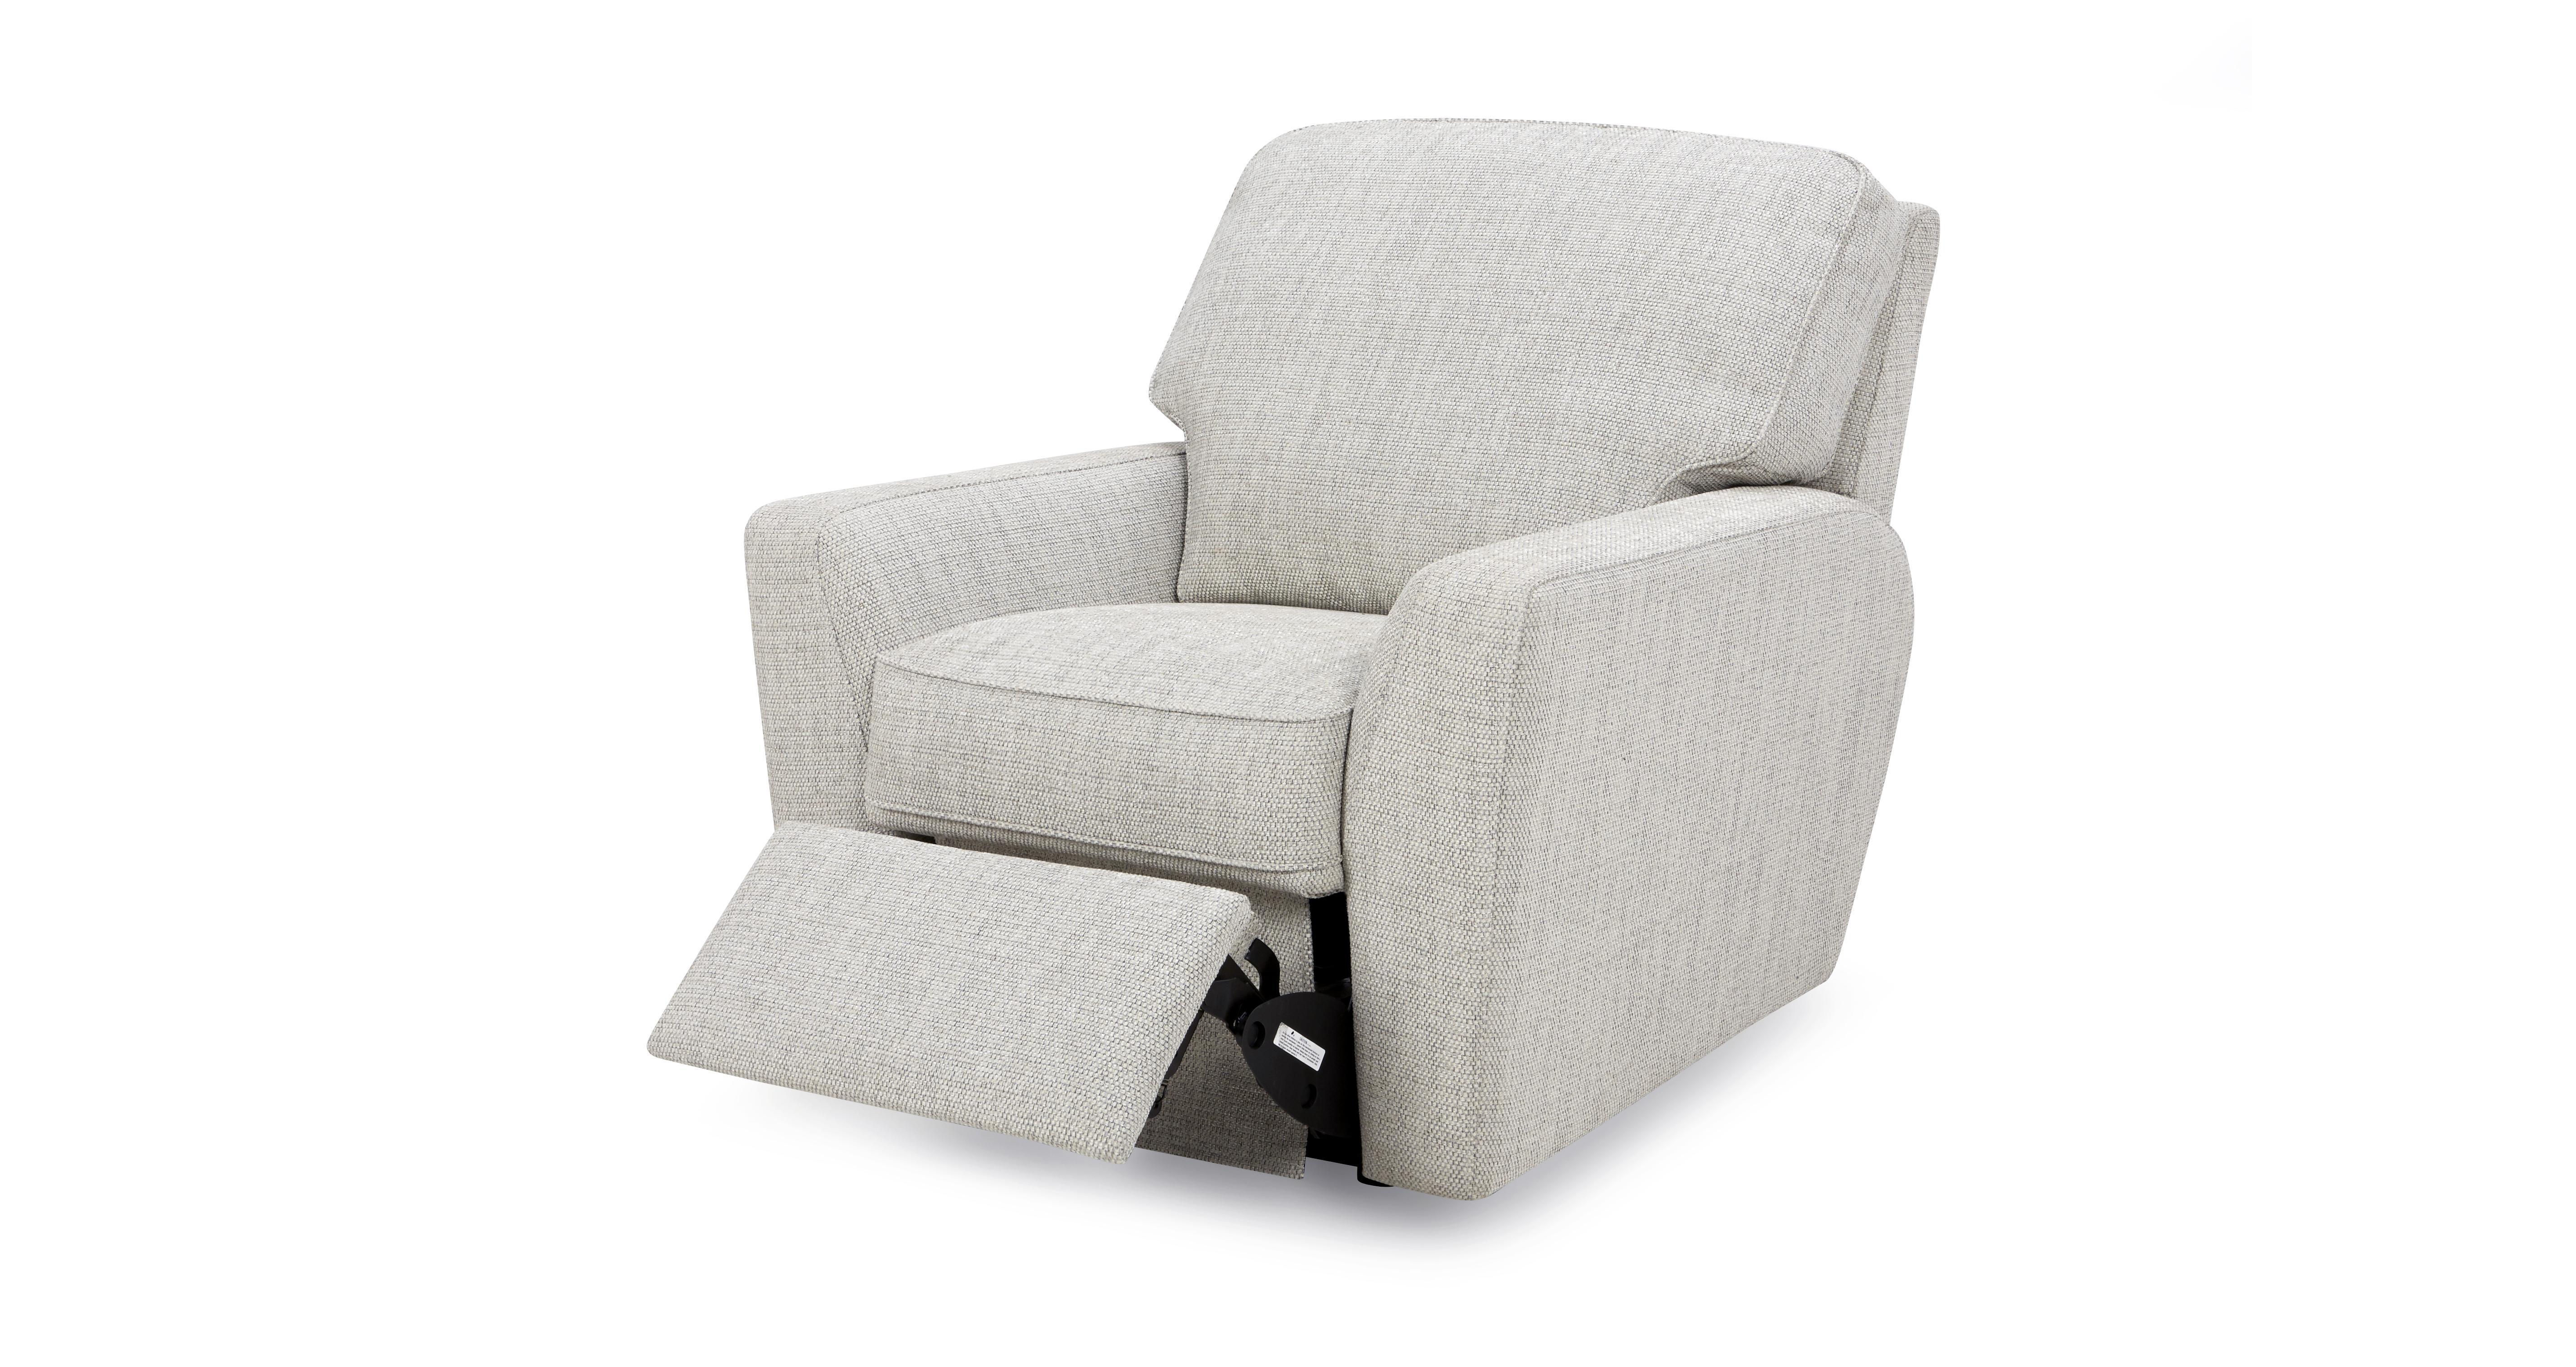 dfs sophia sofa reviews ashley furniture turquoise manual recliner chair